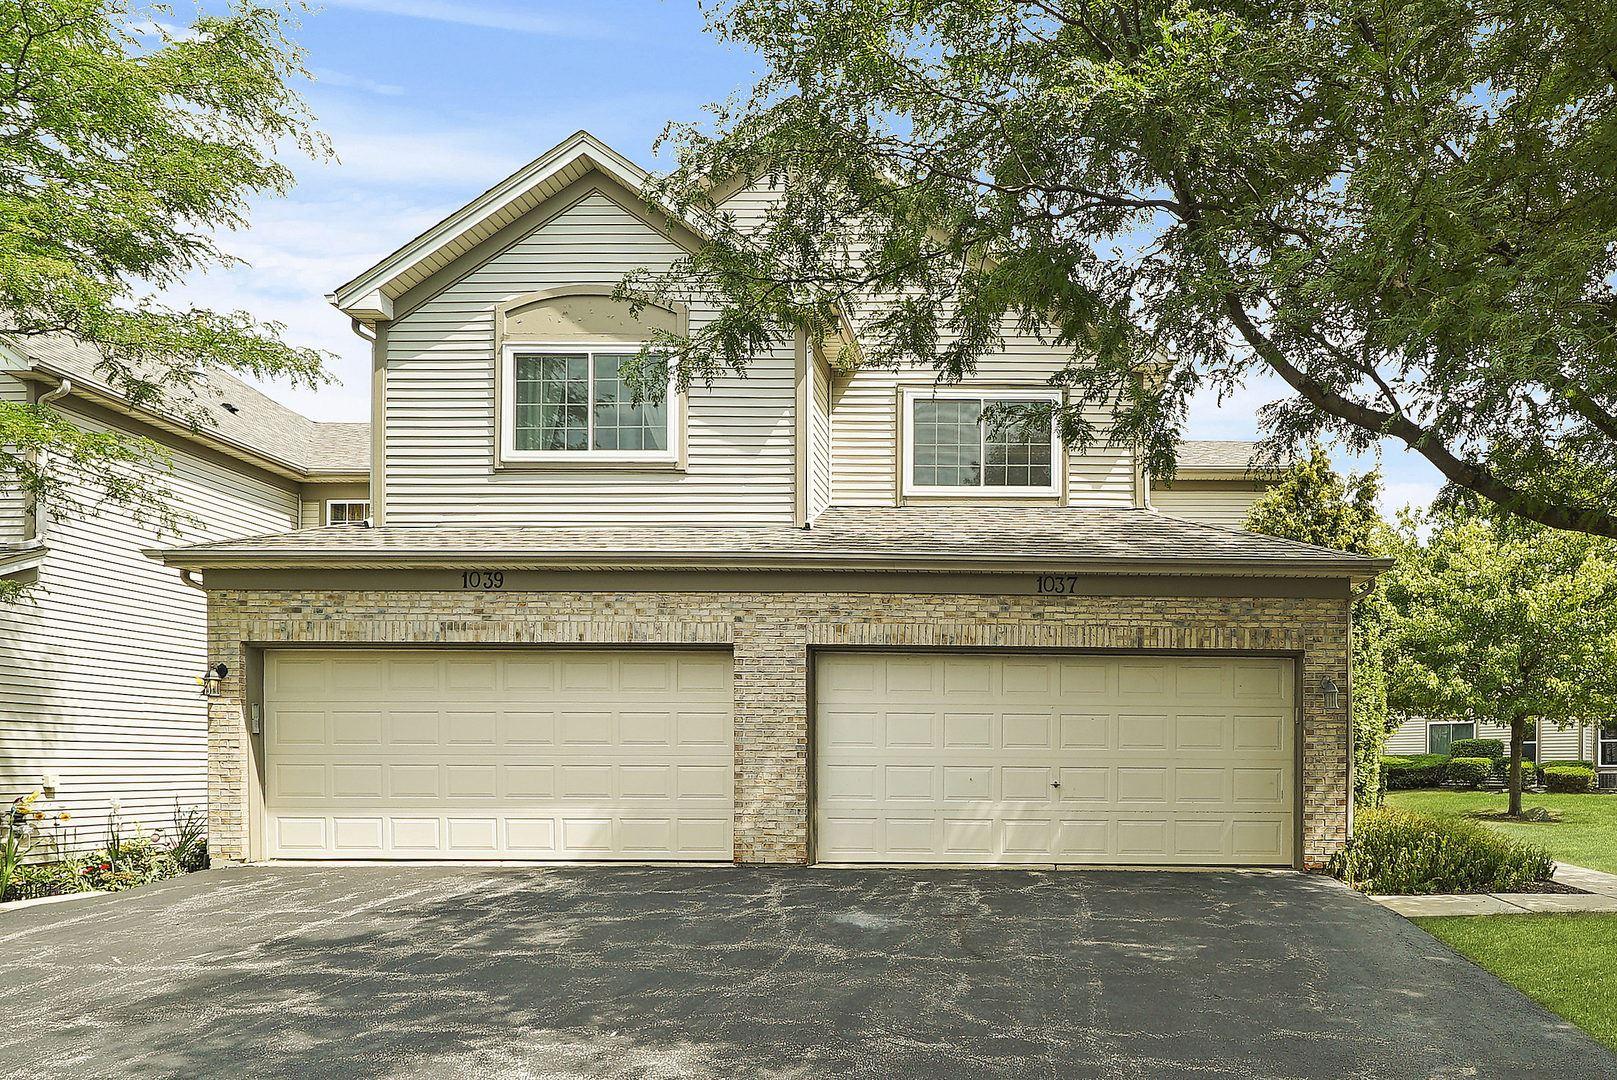 1037 Parkhill Circle, Aurora, IL 60502 - #: 10817306